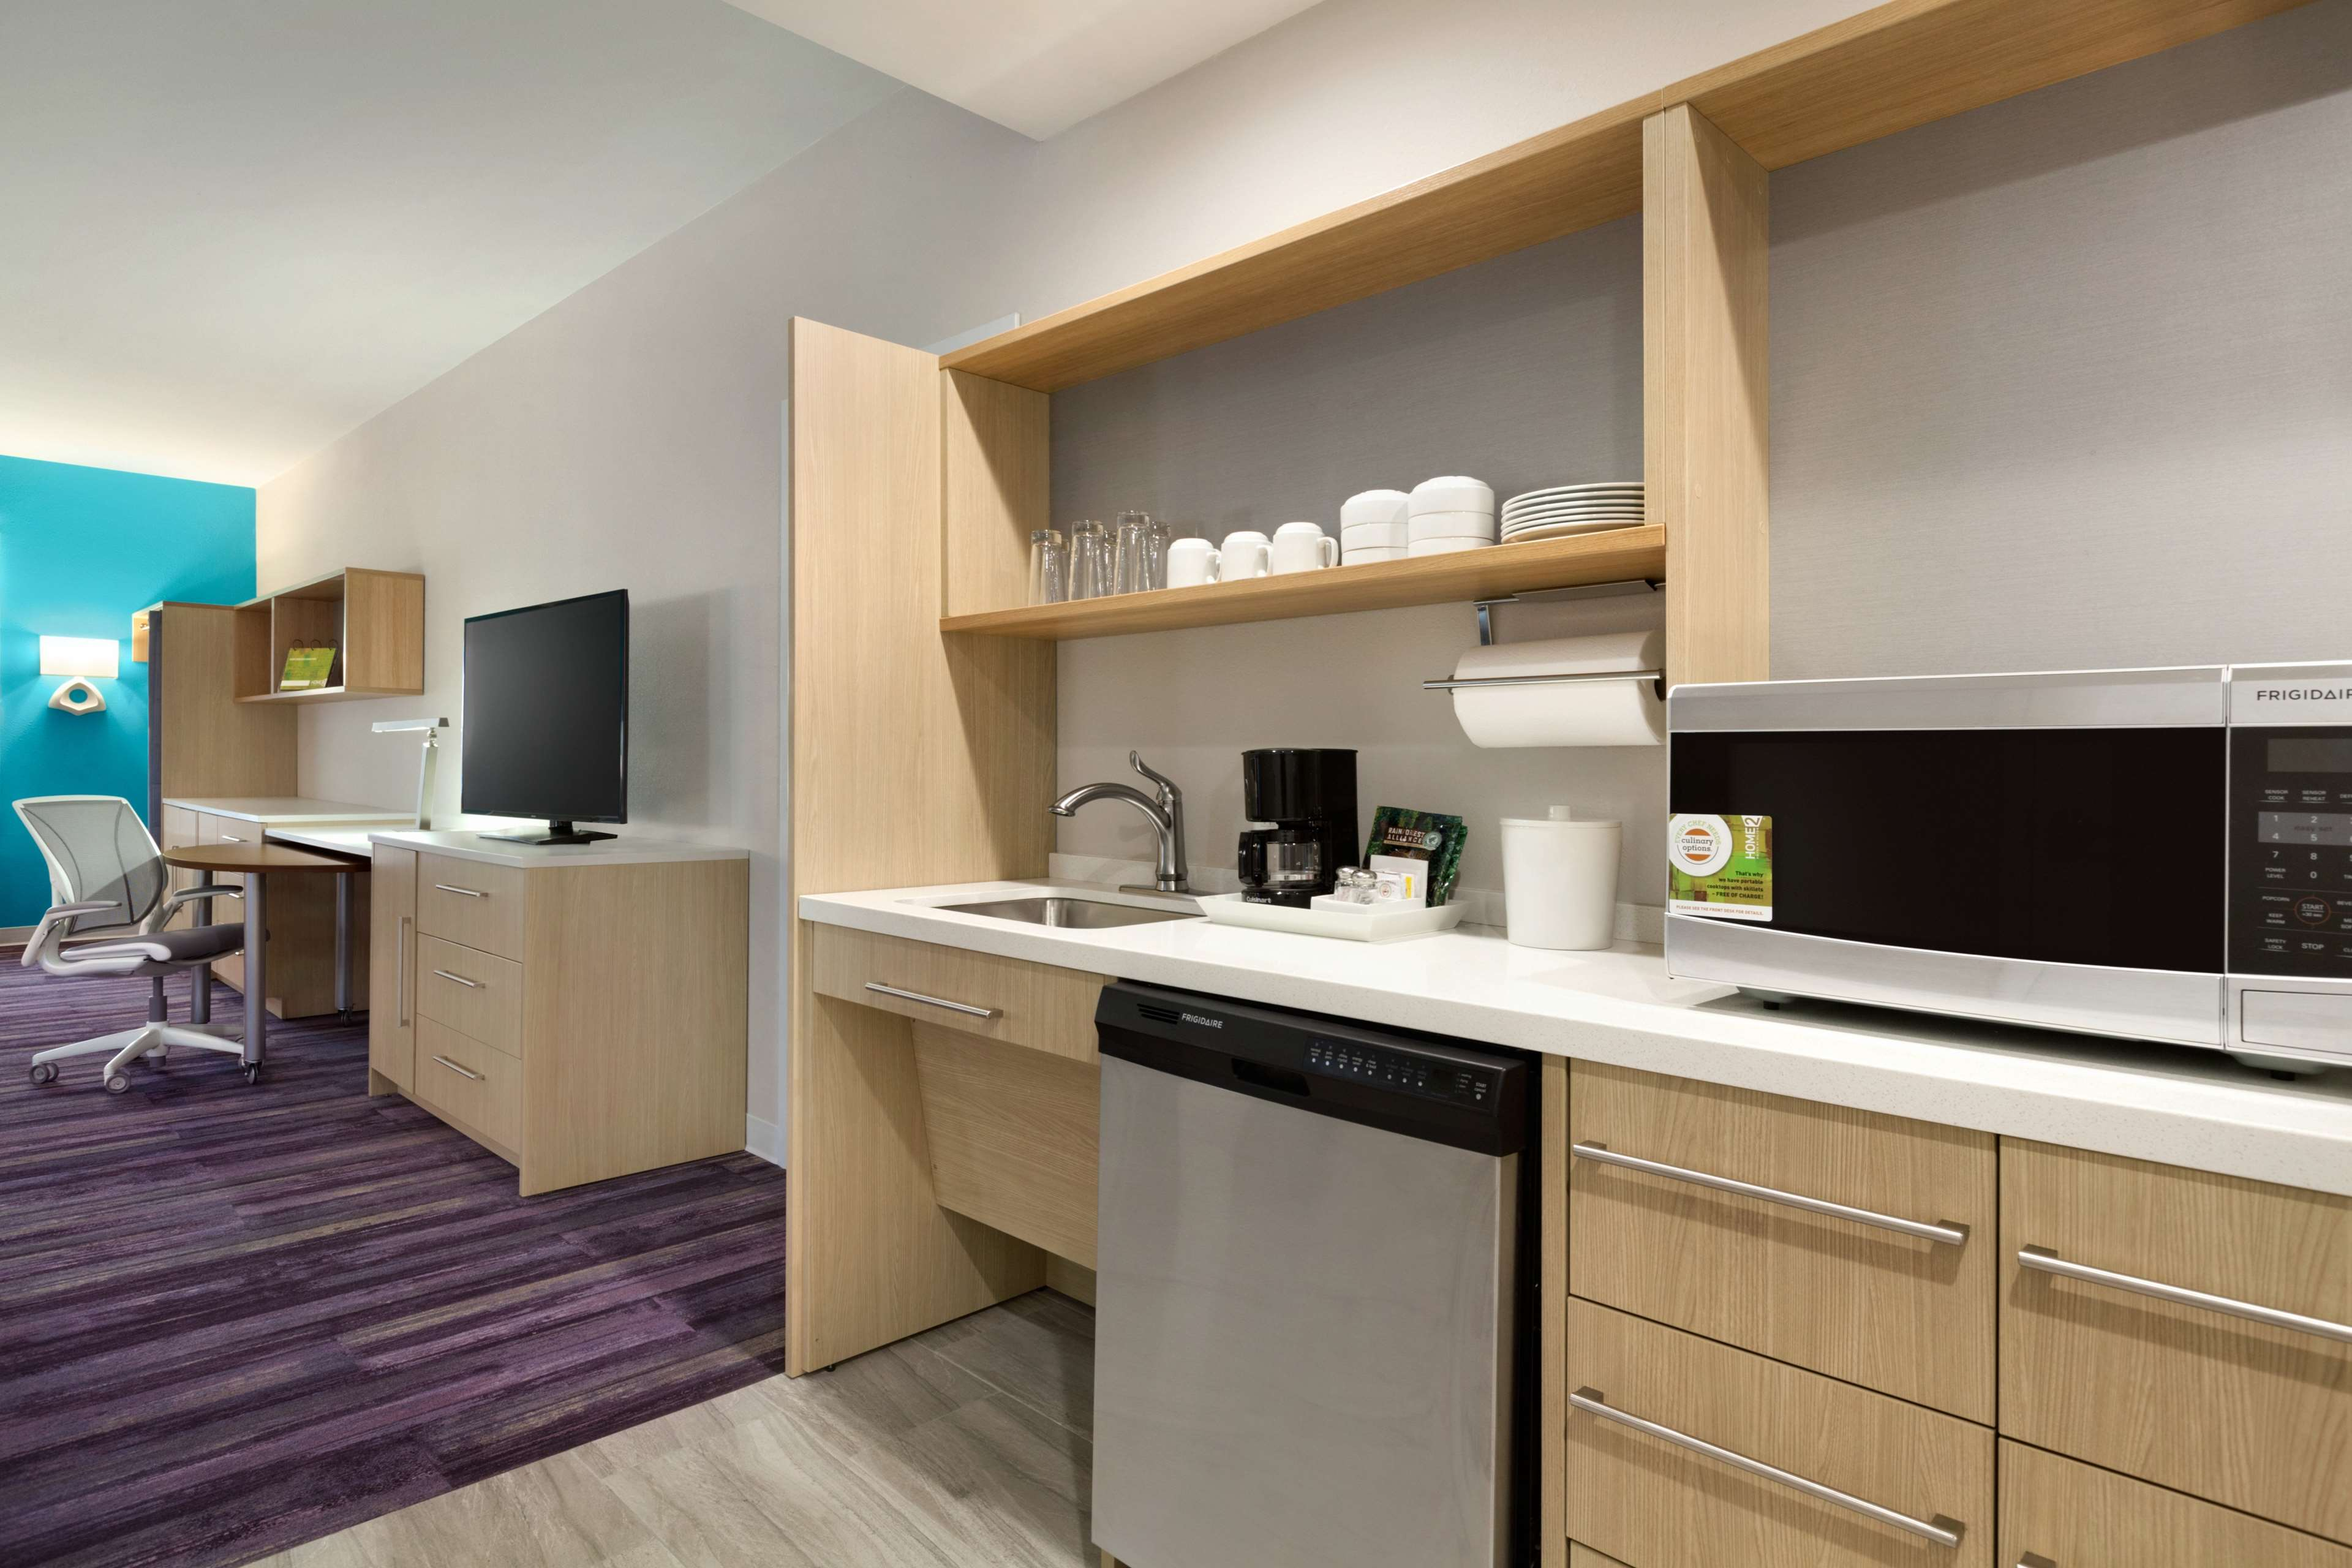 Home2 Suites by Hilton West Monroe image 11